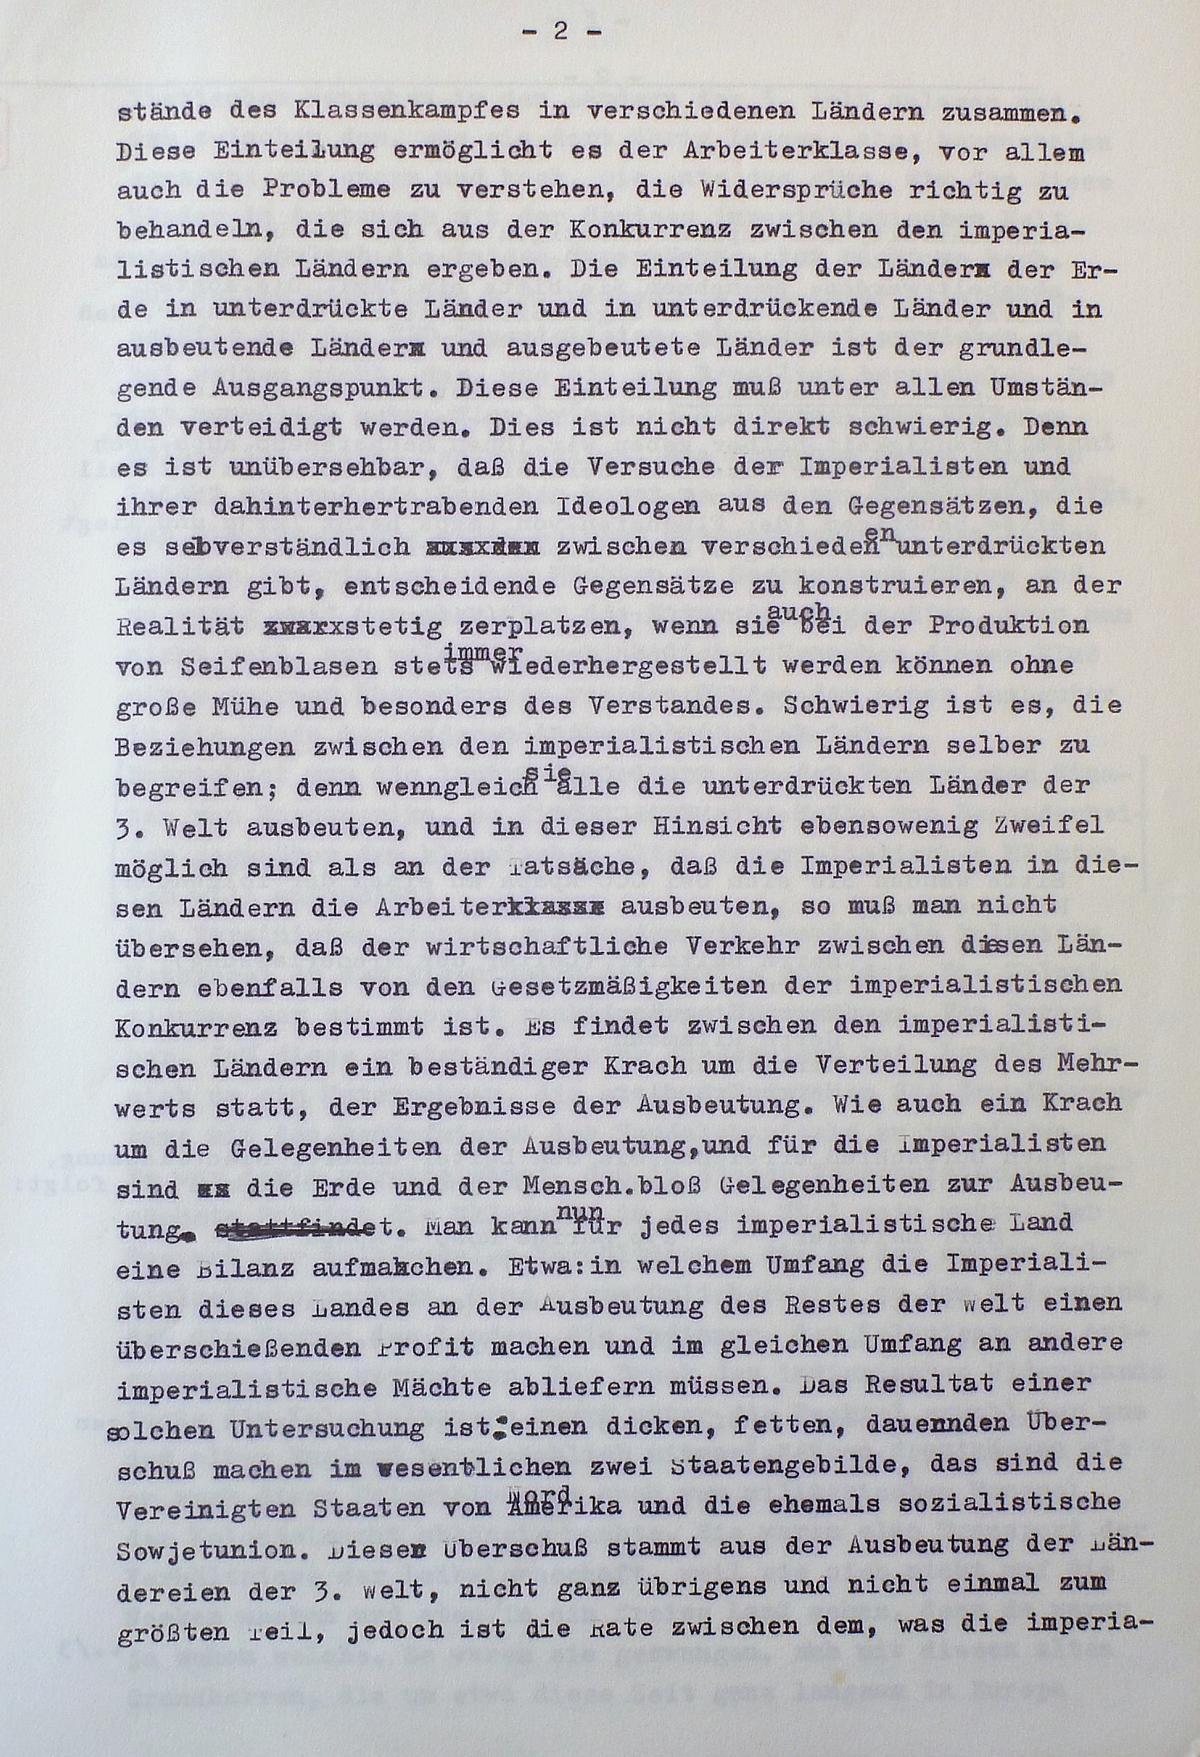 Hamburg_KBW_1978_Fochler002